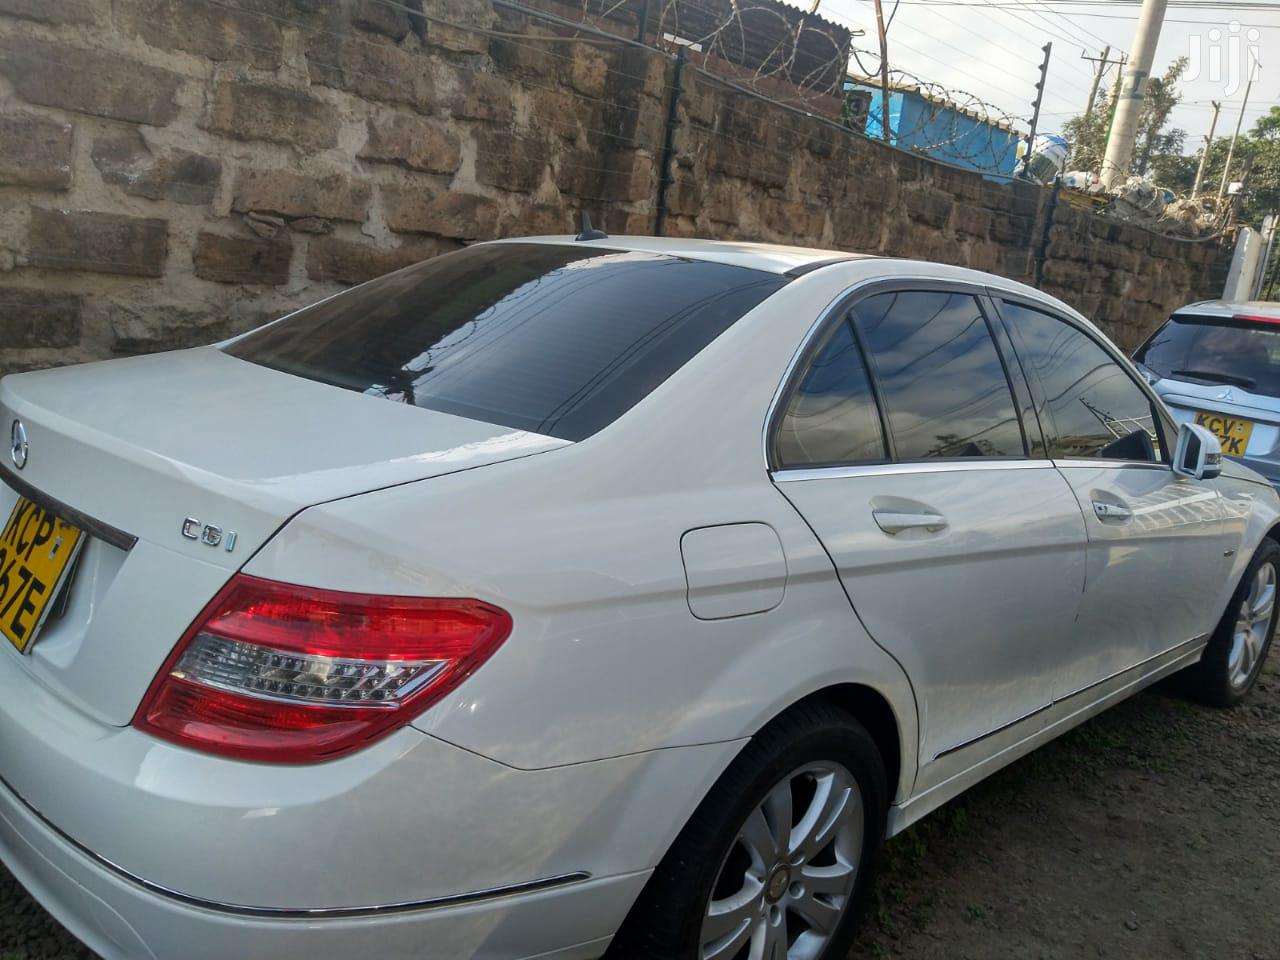 Archive: Mercedes-Benz C200 2010 White